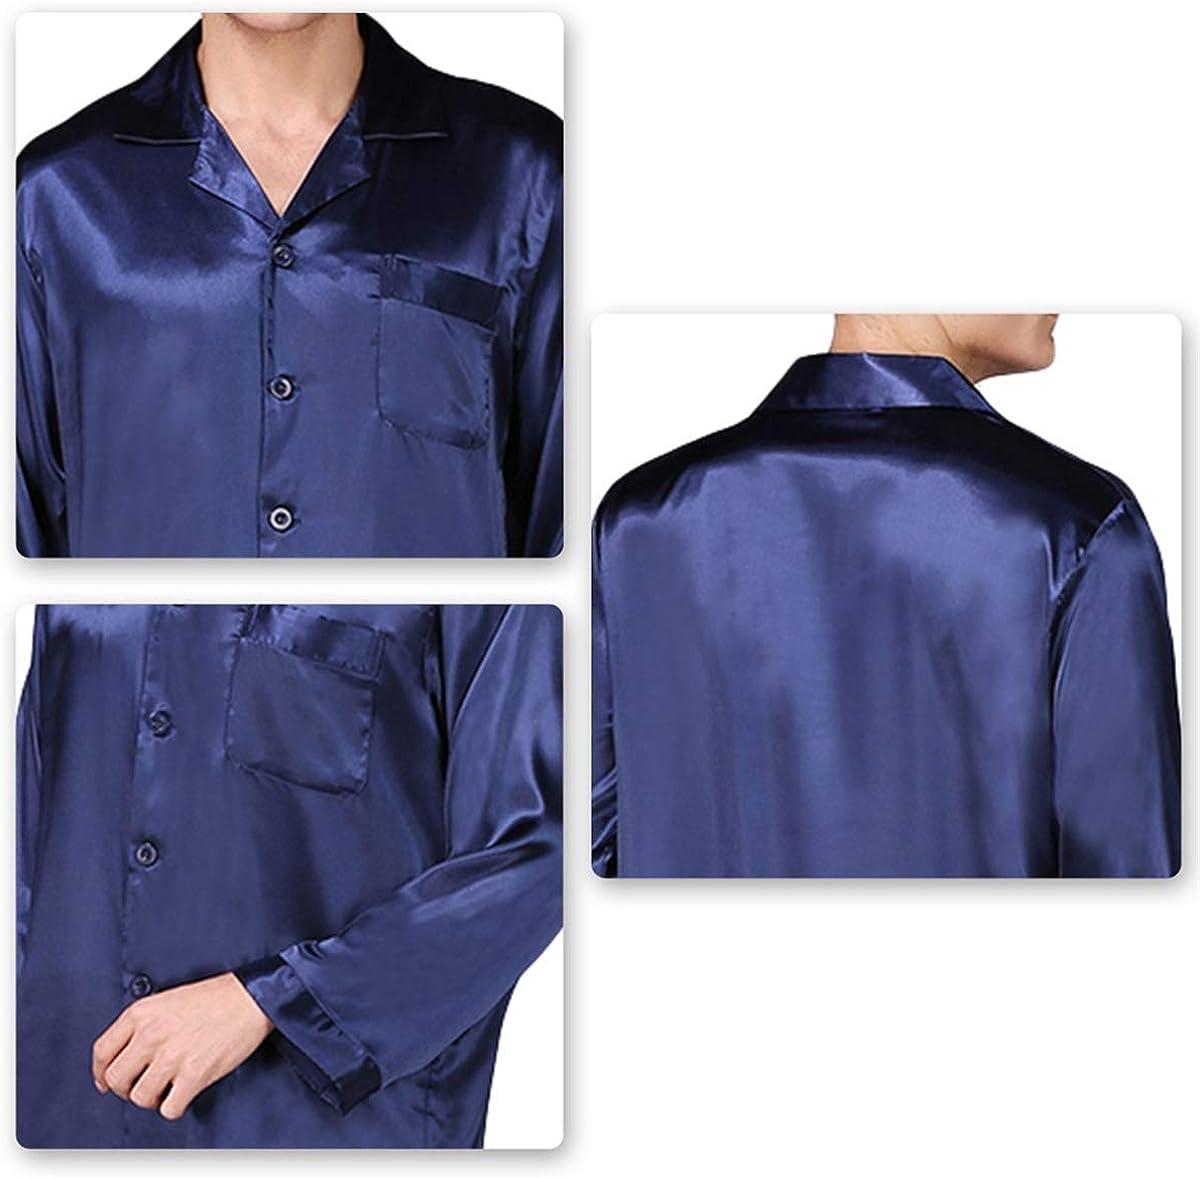 Mens Classic Satin Pajamas Set Button Down Silky Sleepwear Home Solid Loungewear